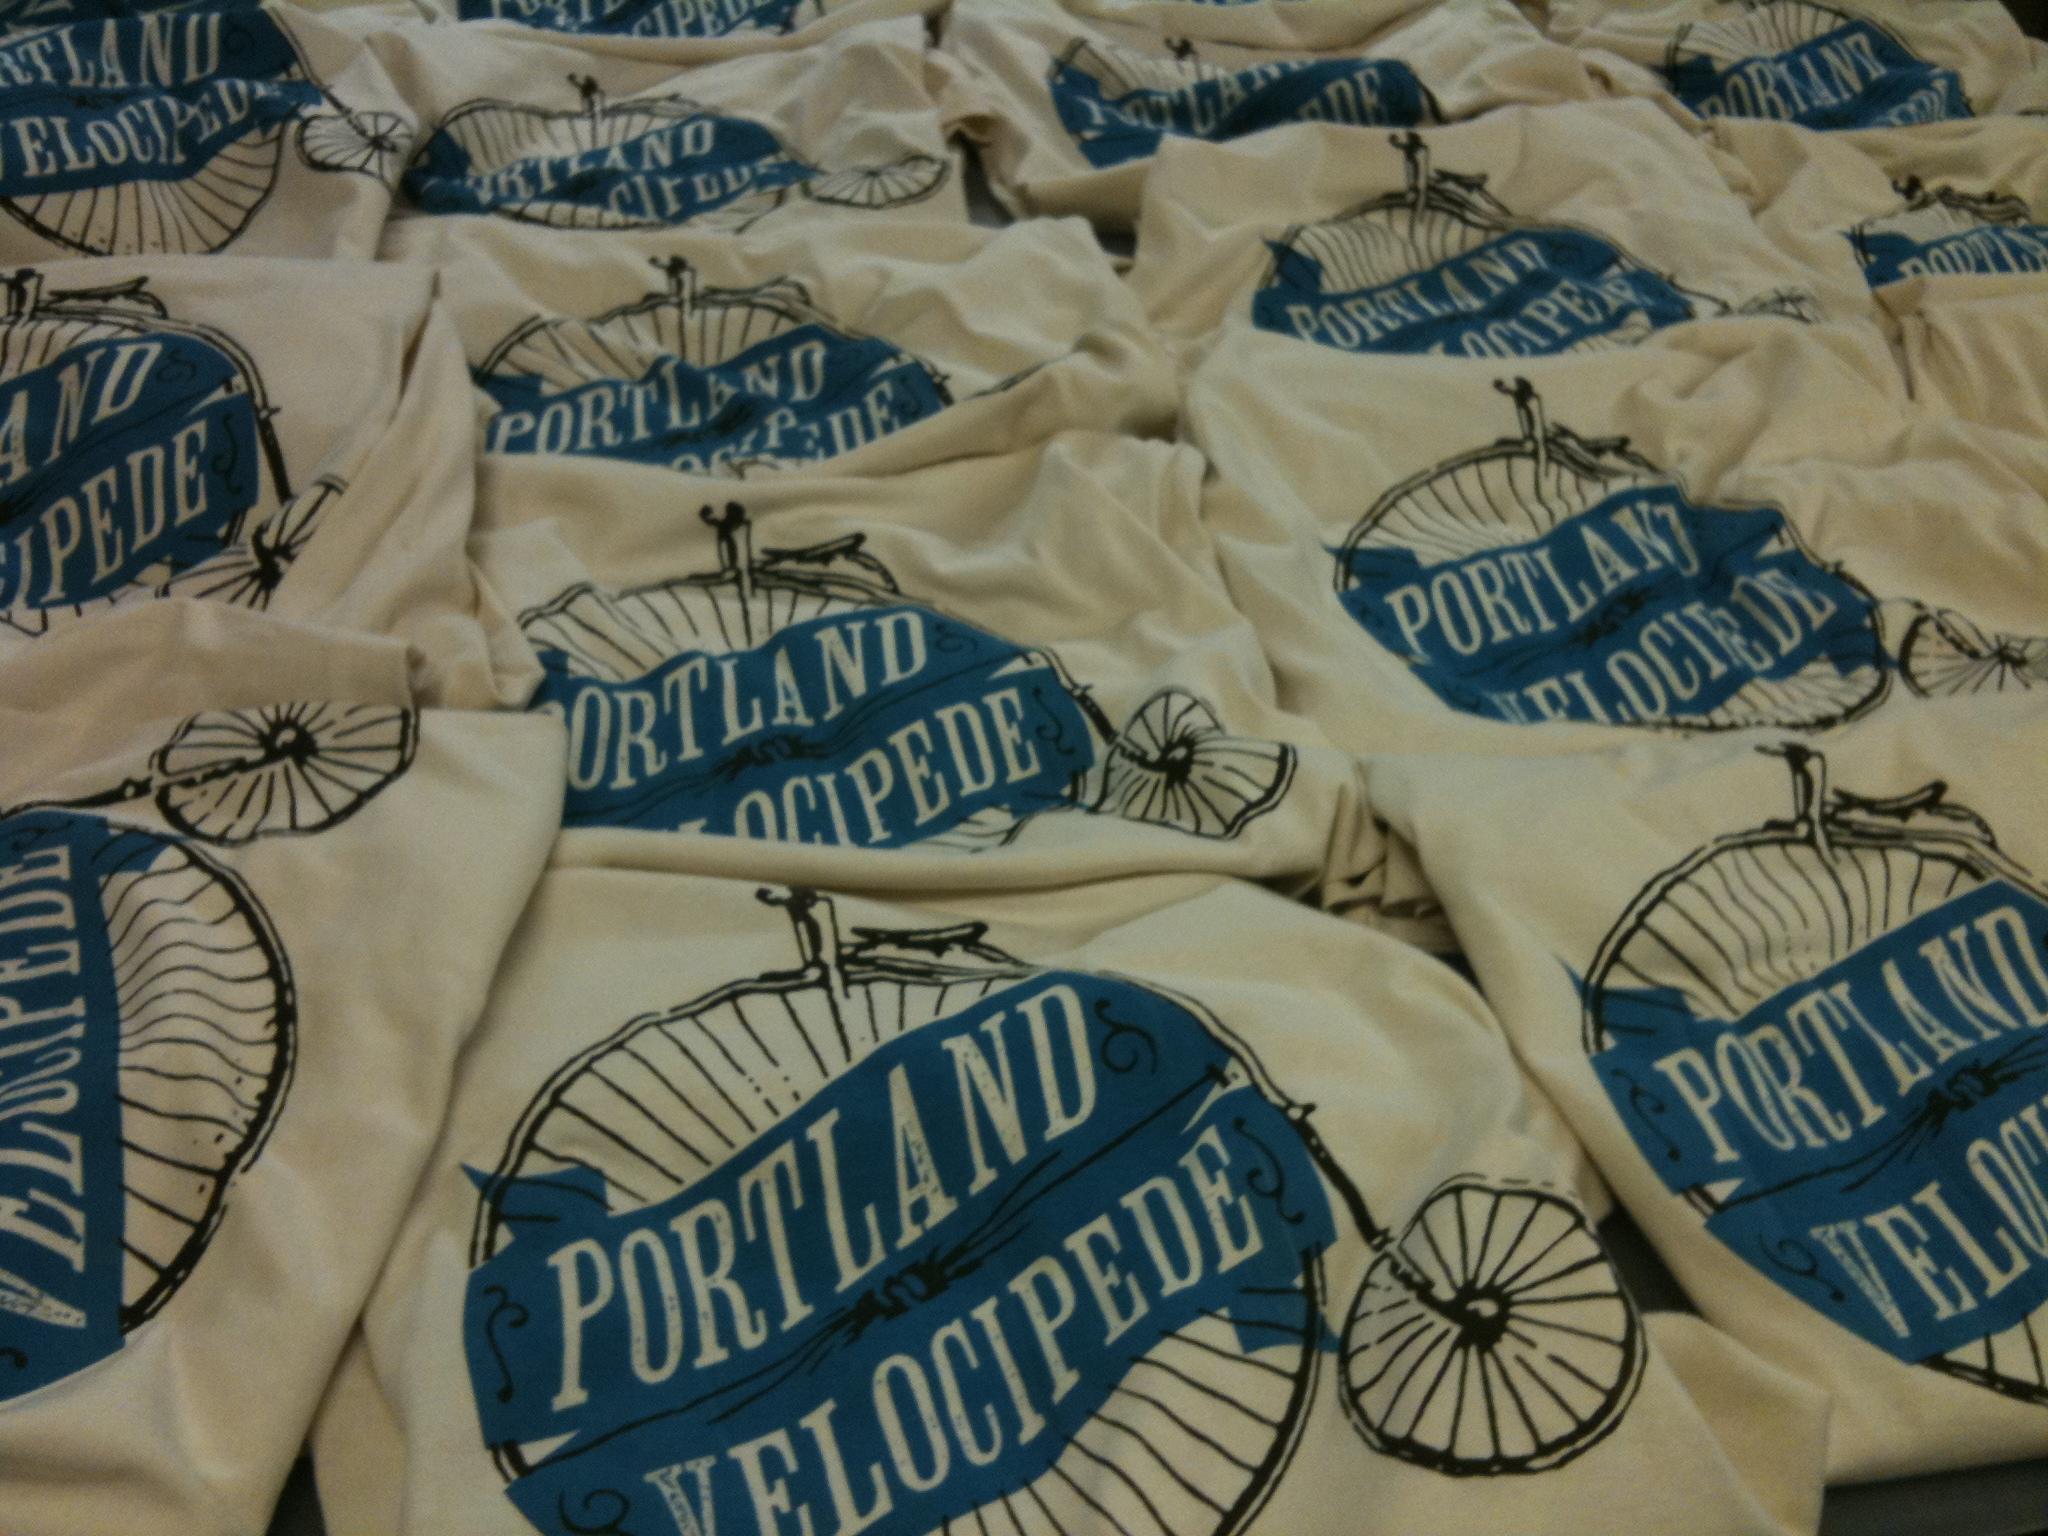 Bicycle kris johnsen art blog for T shirt printing in portland oregon